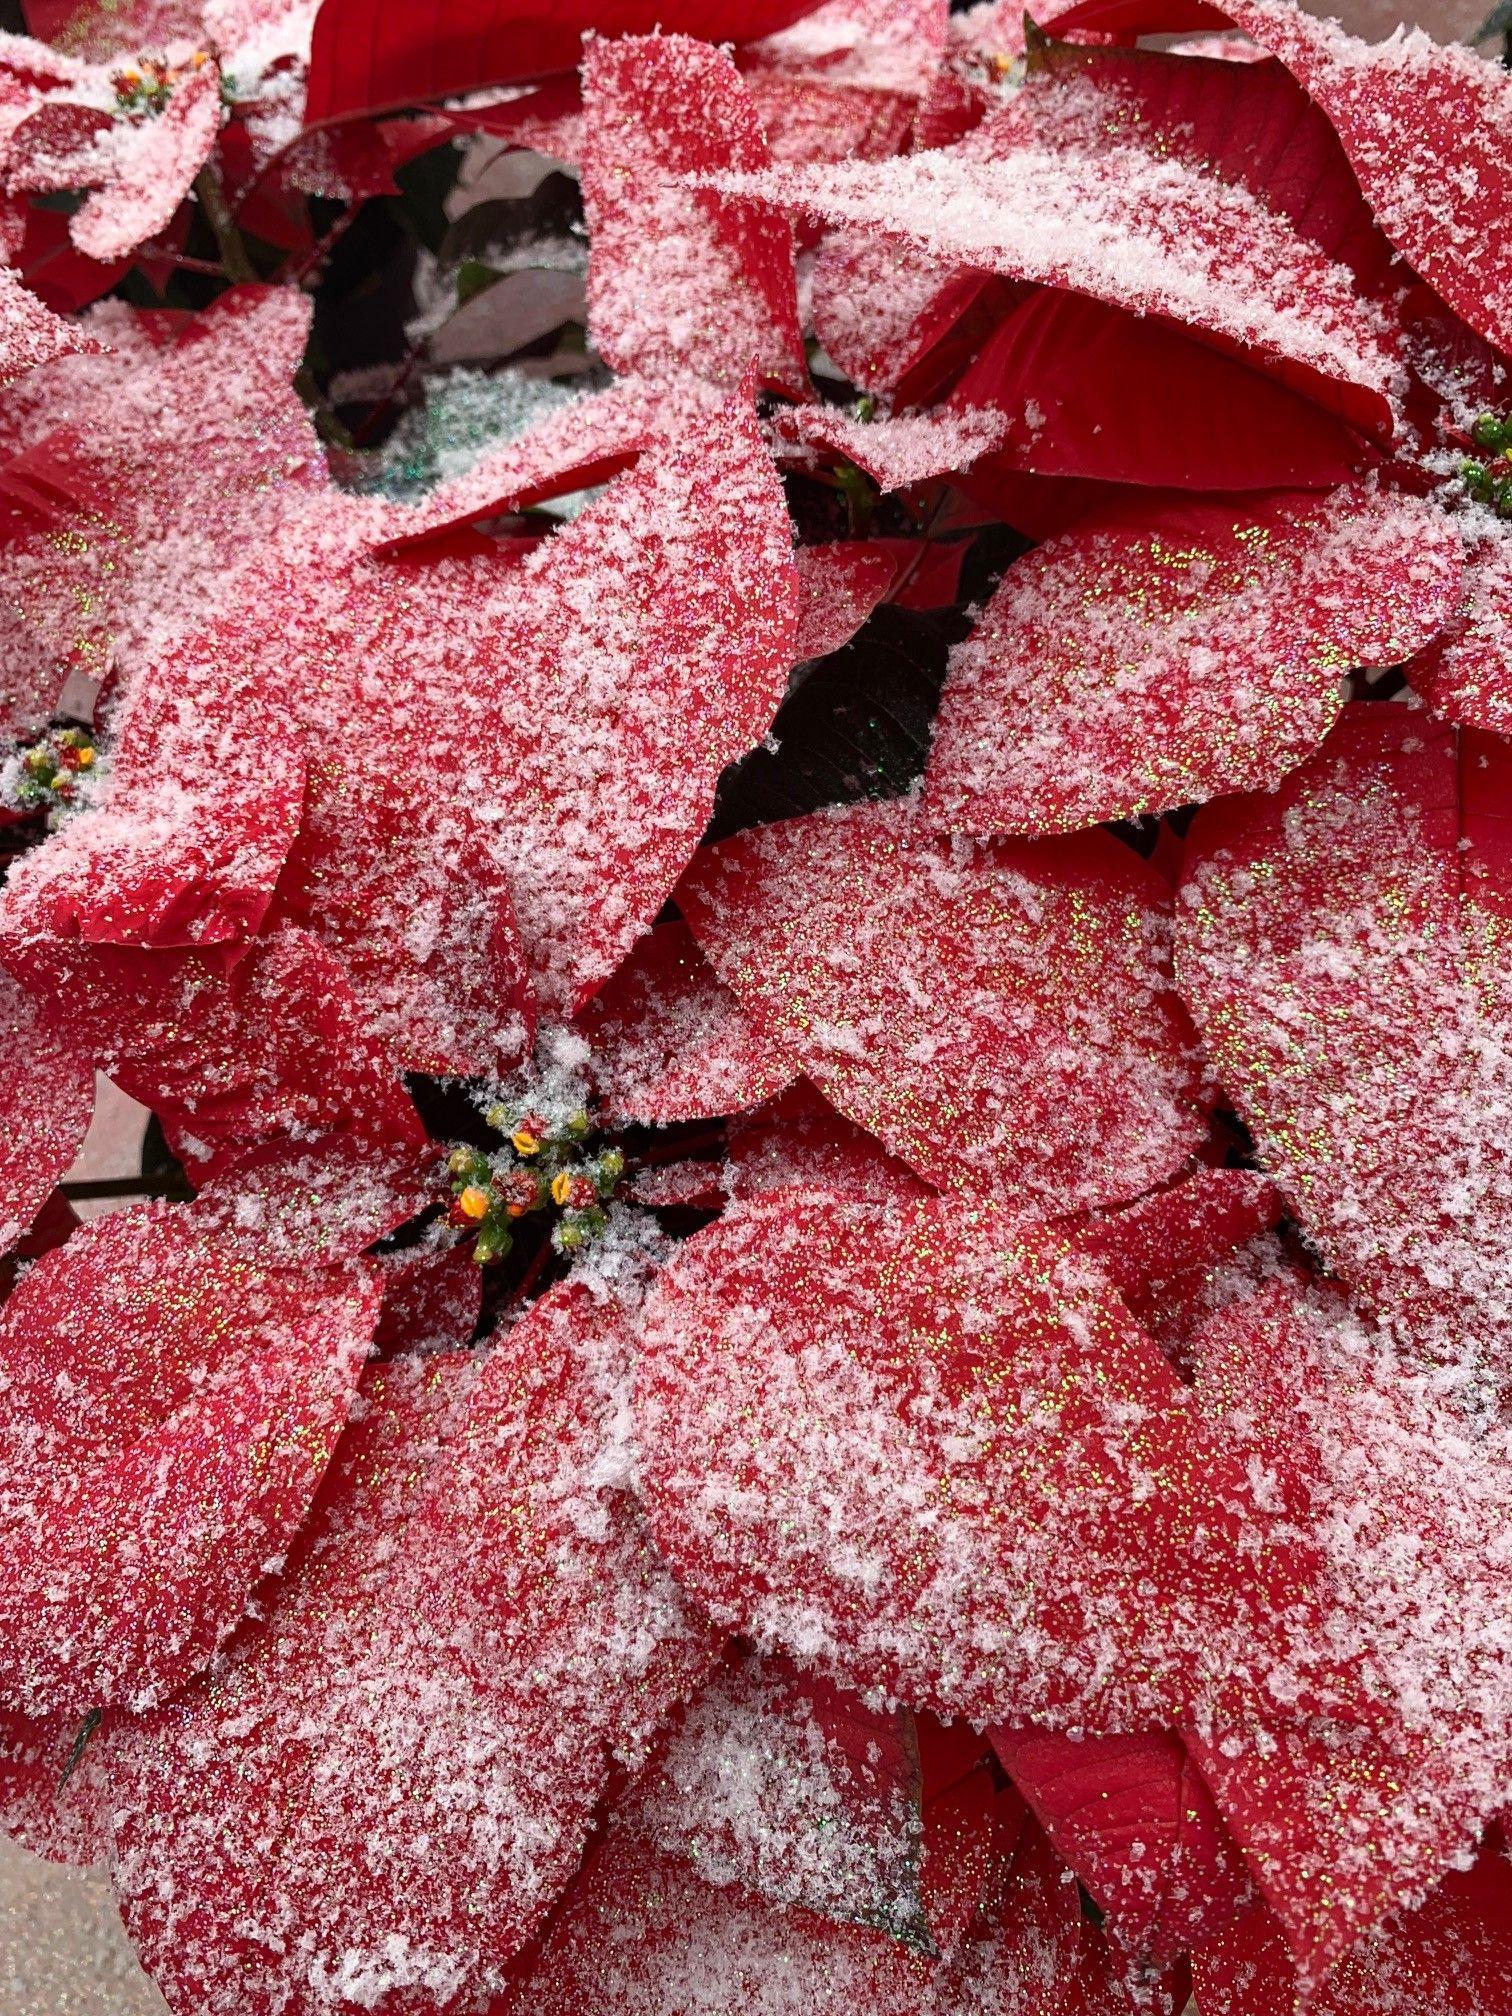 Fantasy Colors Poinsettias Red Poinsettia With Glue Snow